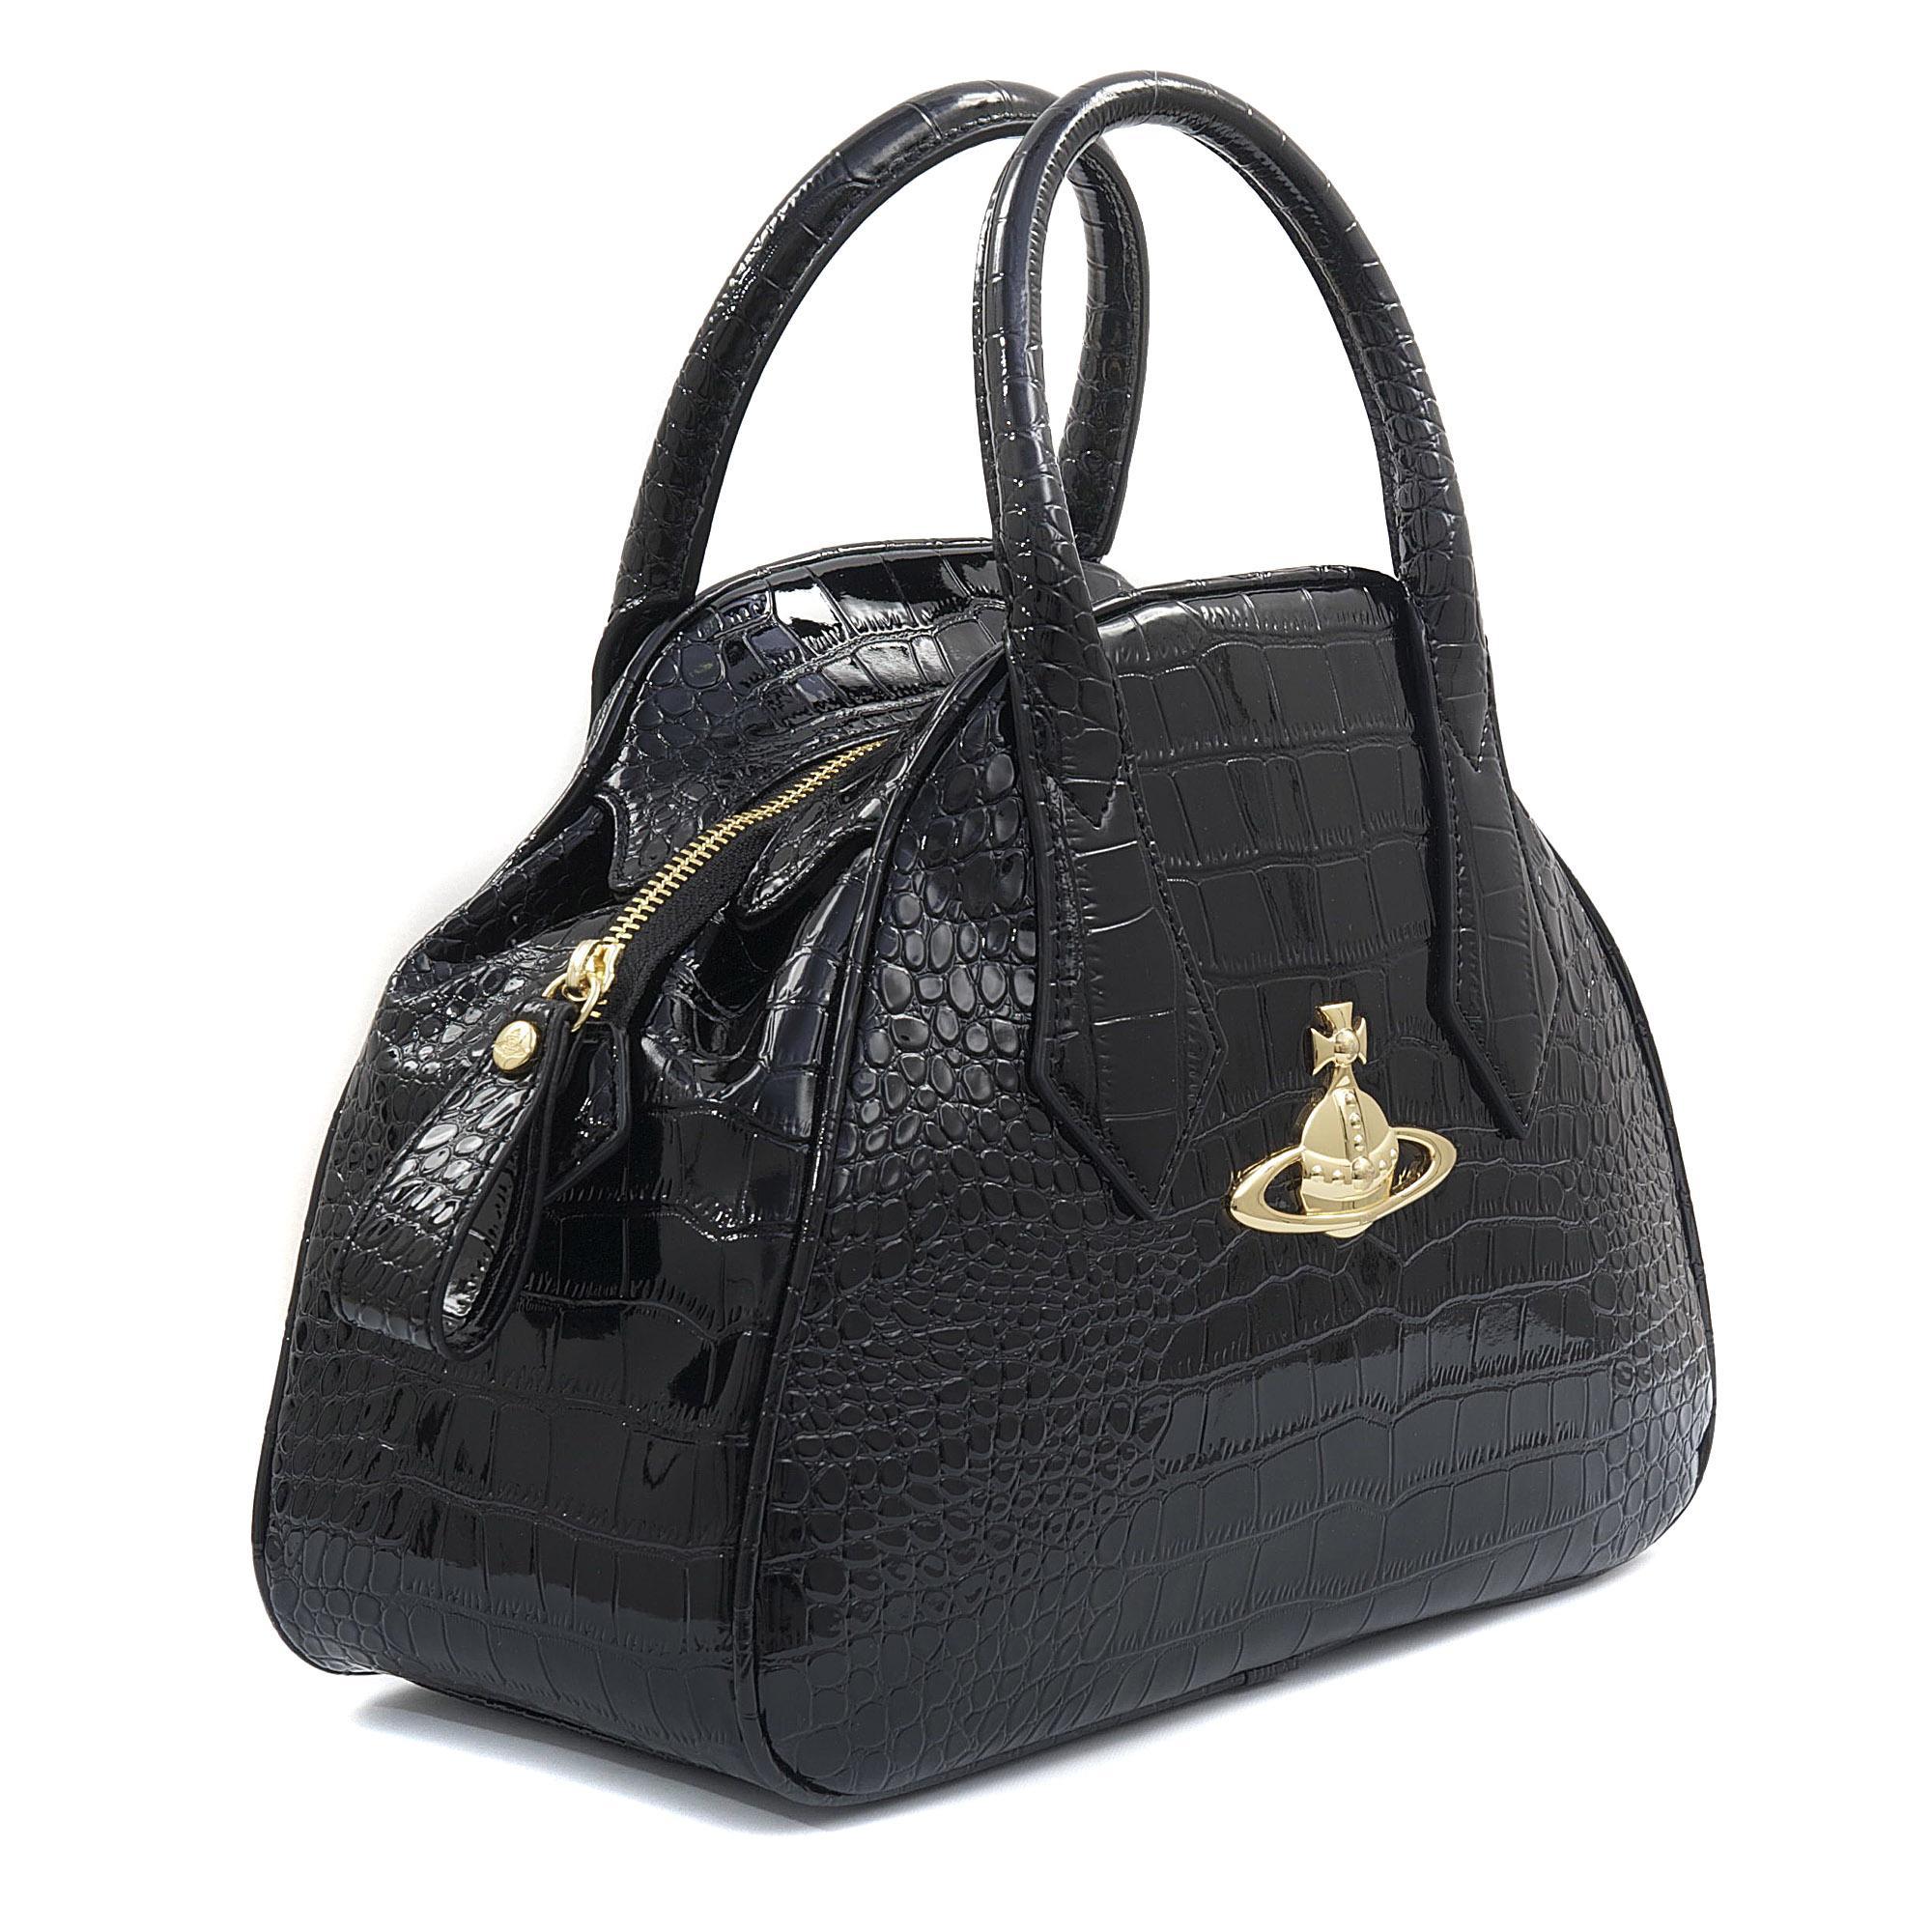 65e966f8cf46 Vivienne Westwood Yasmin New Chancery Bag in Black - Lyst